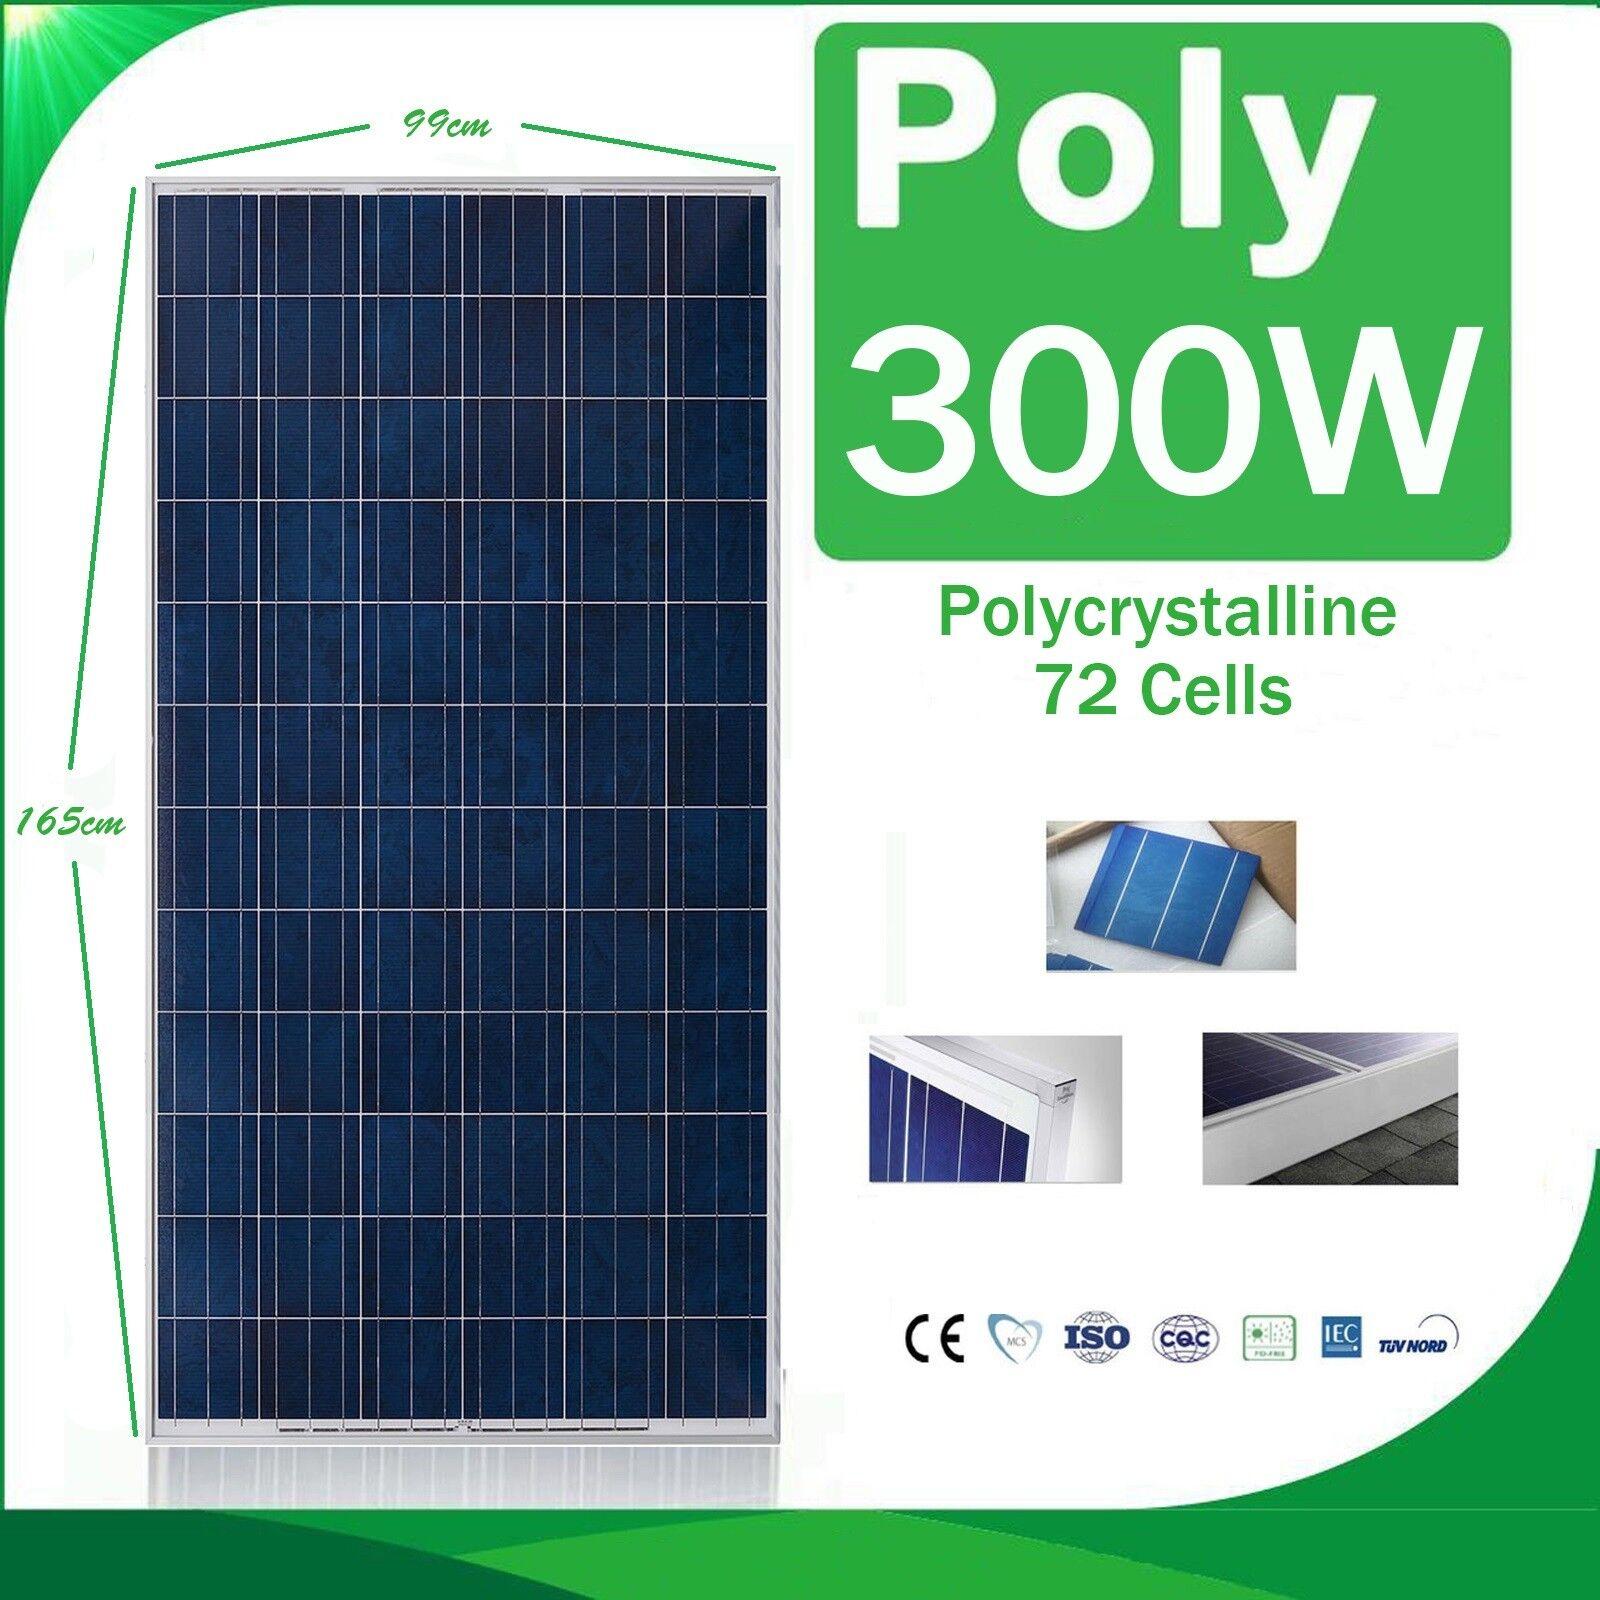 Placa Solar 300w Panel Solar 24v Fotovoltaico Polycrystalline 12v 24v 48v